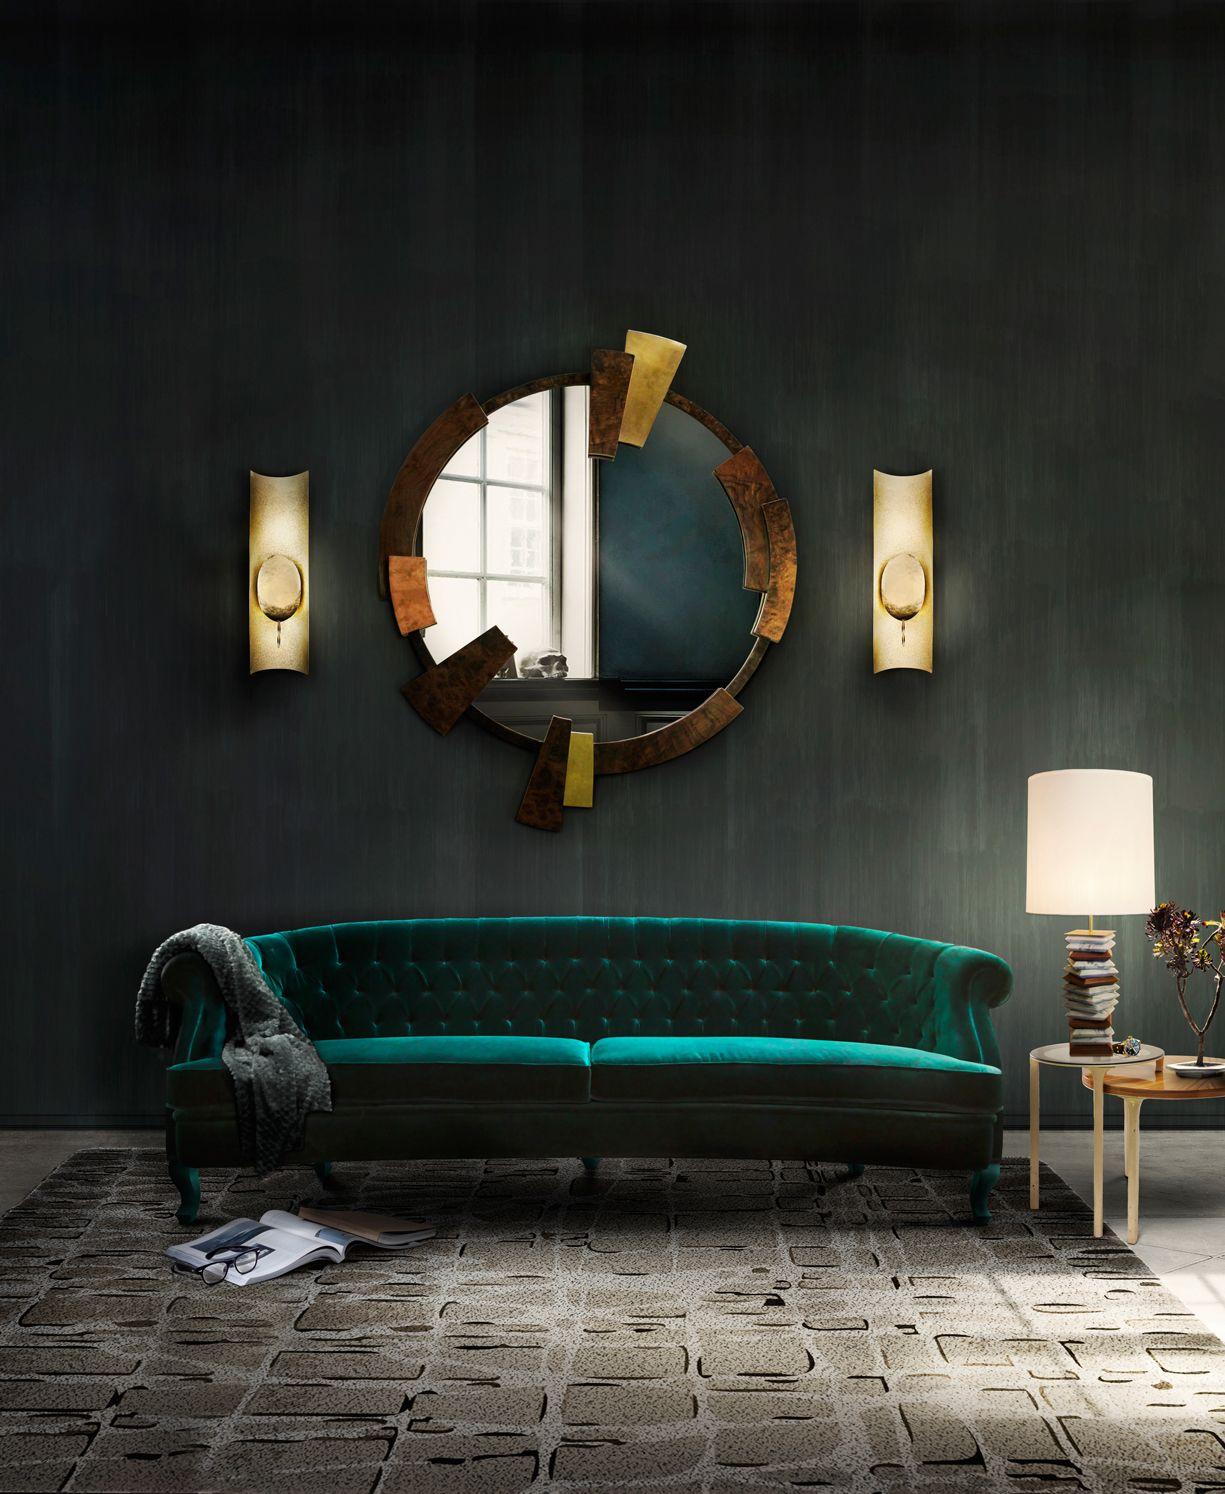 MAREE Lounge Sofa Mid Century Modern Furniture by BRABBU is ideal ...